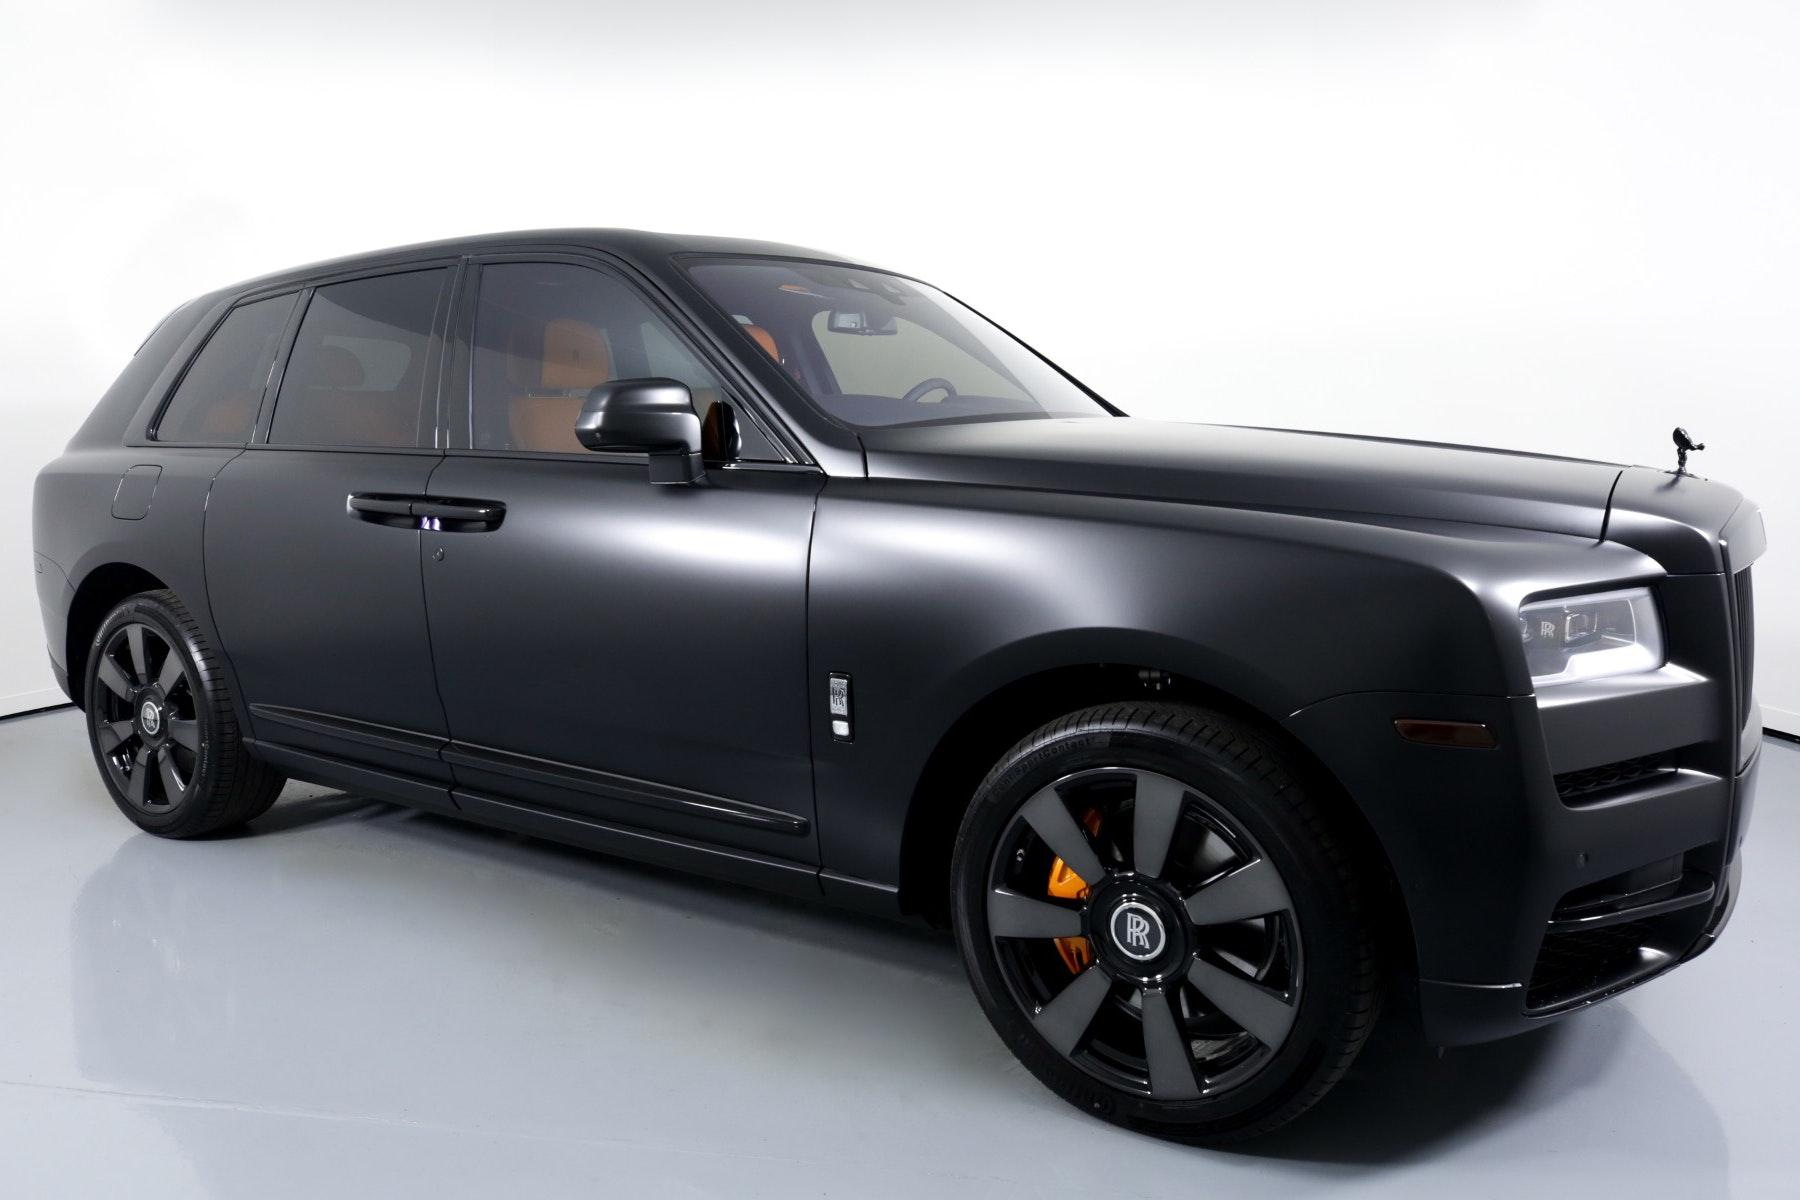 Miami 2020 Rolls Royce Cullinan image #3